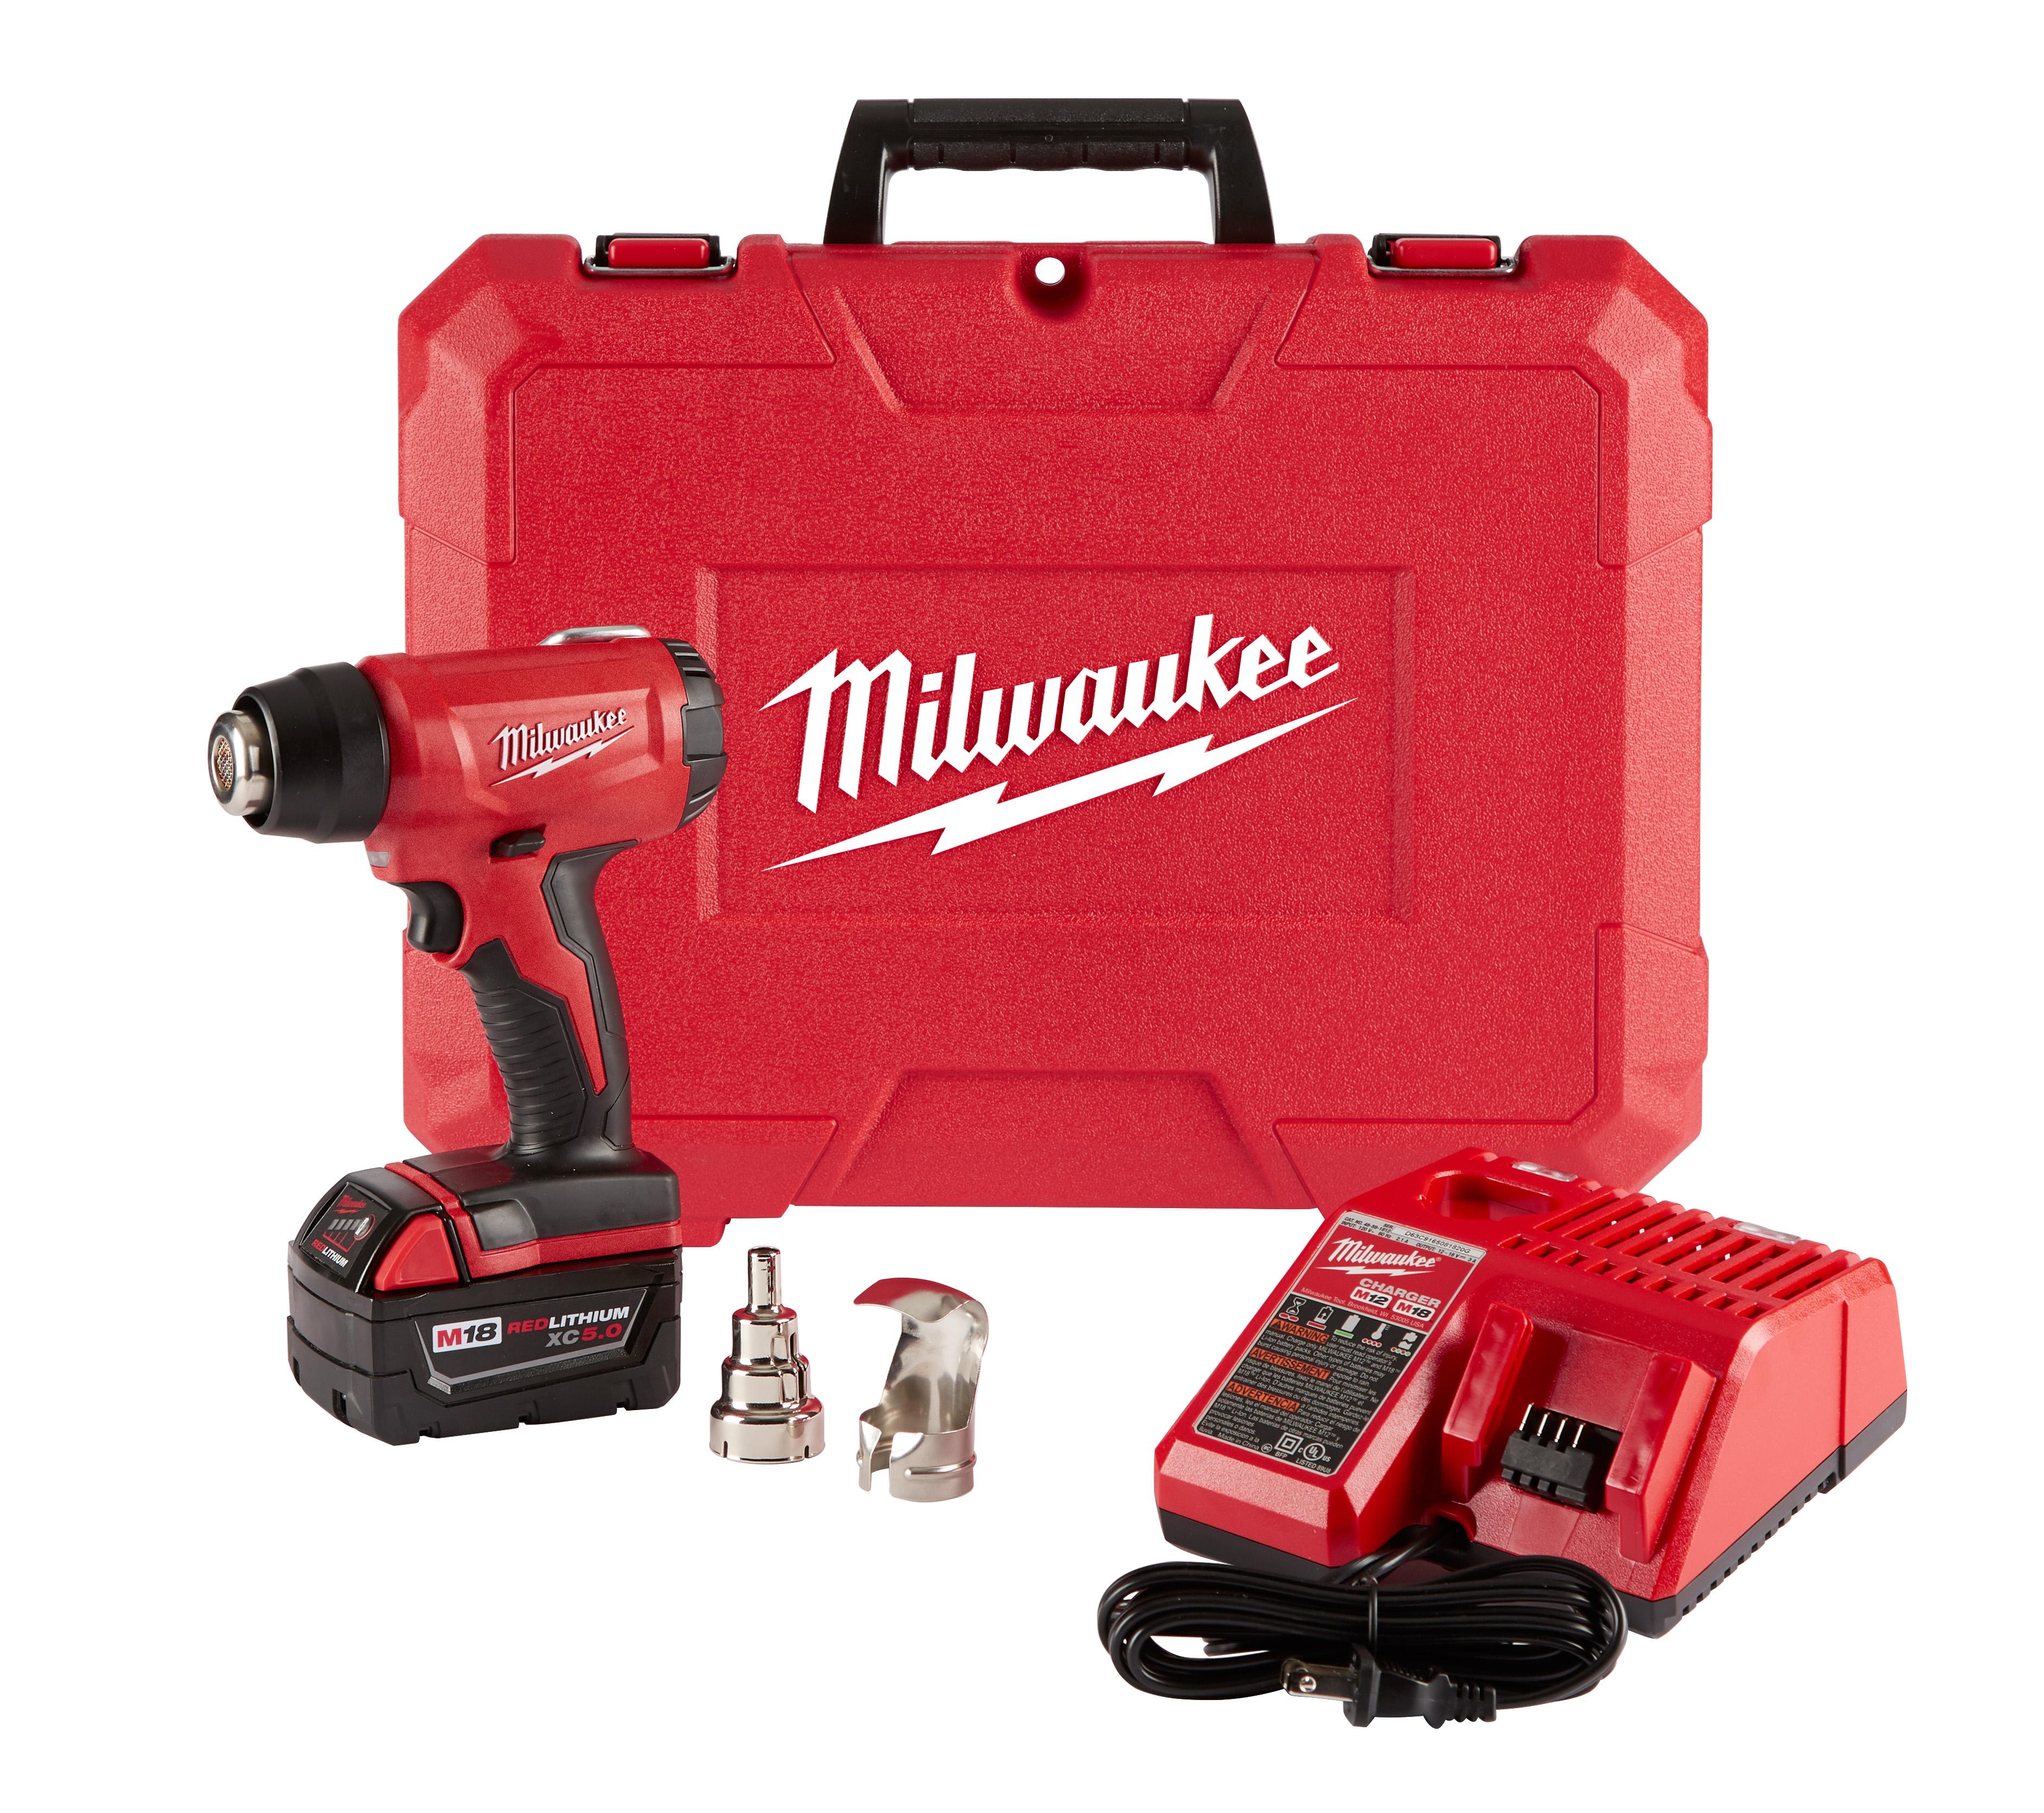 Milwaukee® 2688-20 Compact Cordless Heat Gun, 18 VDC REDLITHIUM™ Battery